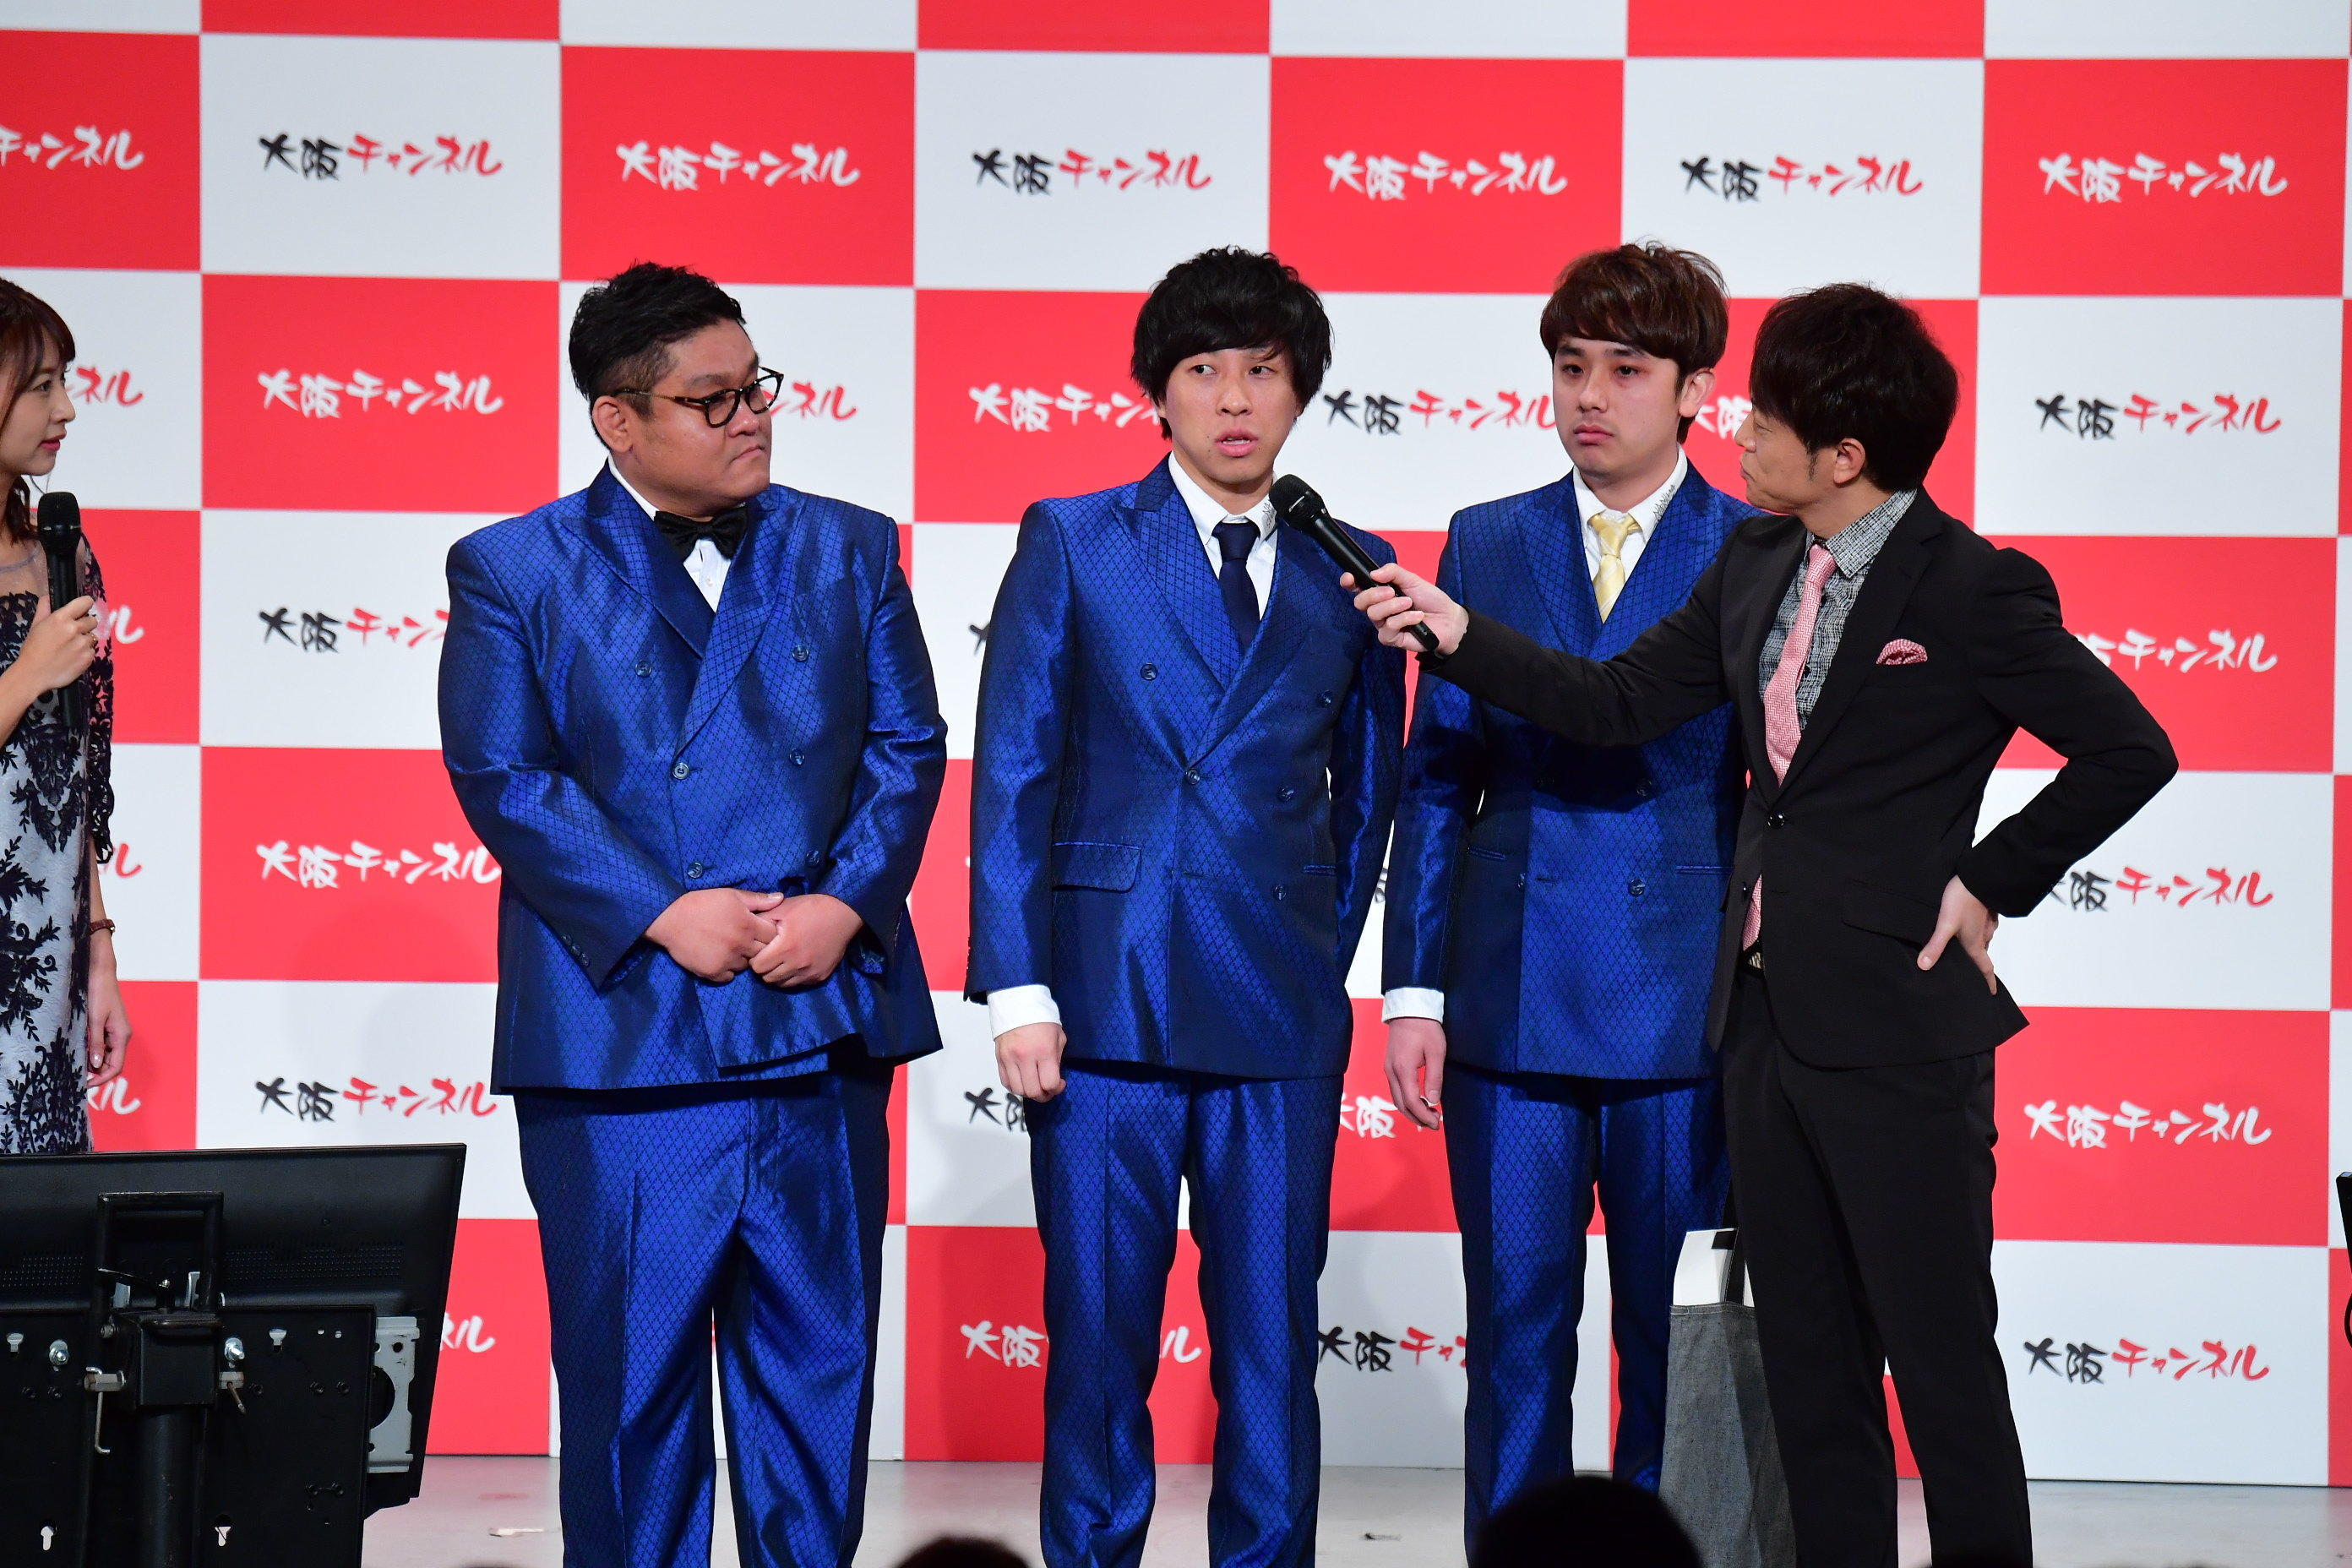 http://news.yoshimoto.co.jp/20180514224428-471eb270dfa1739c2134e45f80e503a01bc4c8cc.jpg